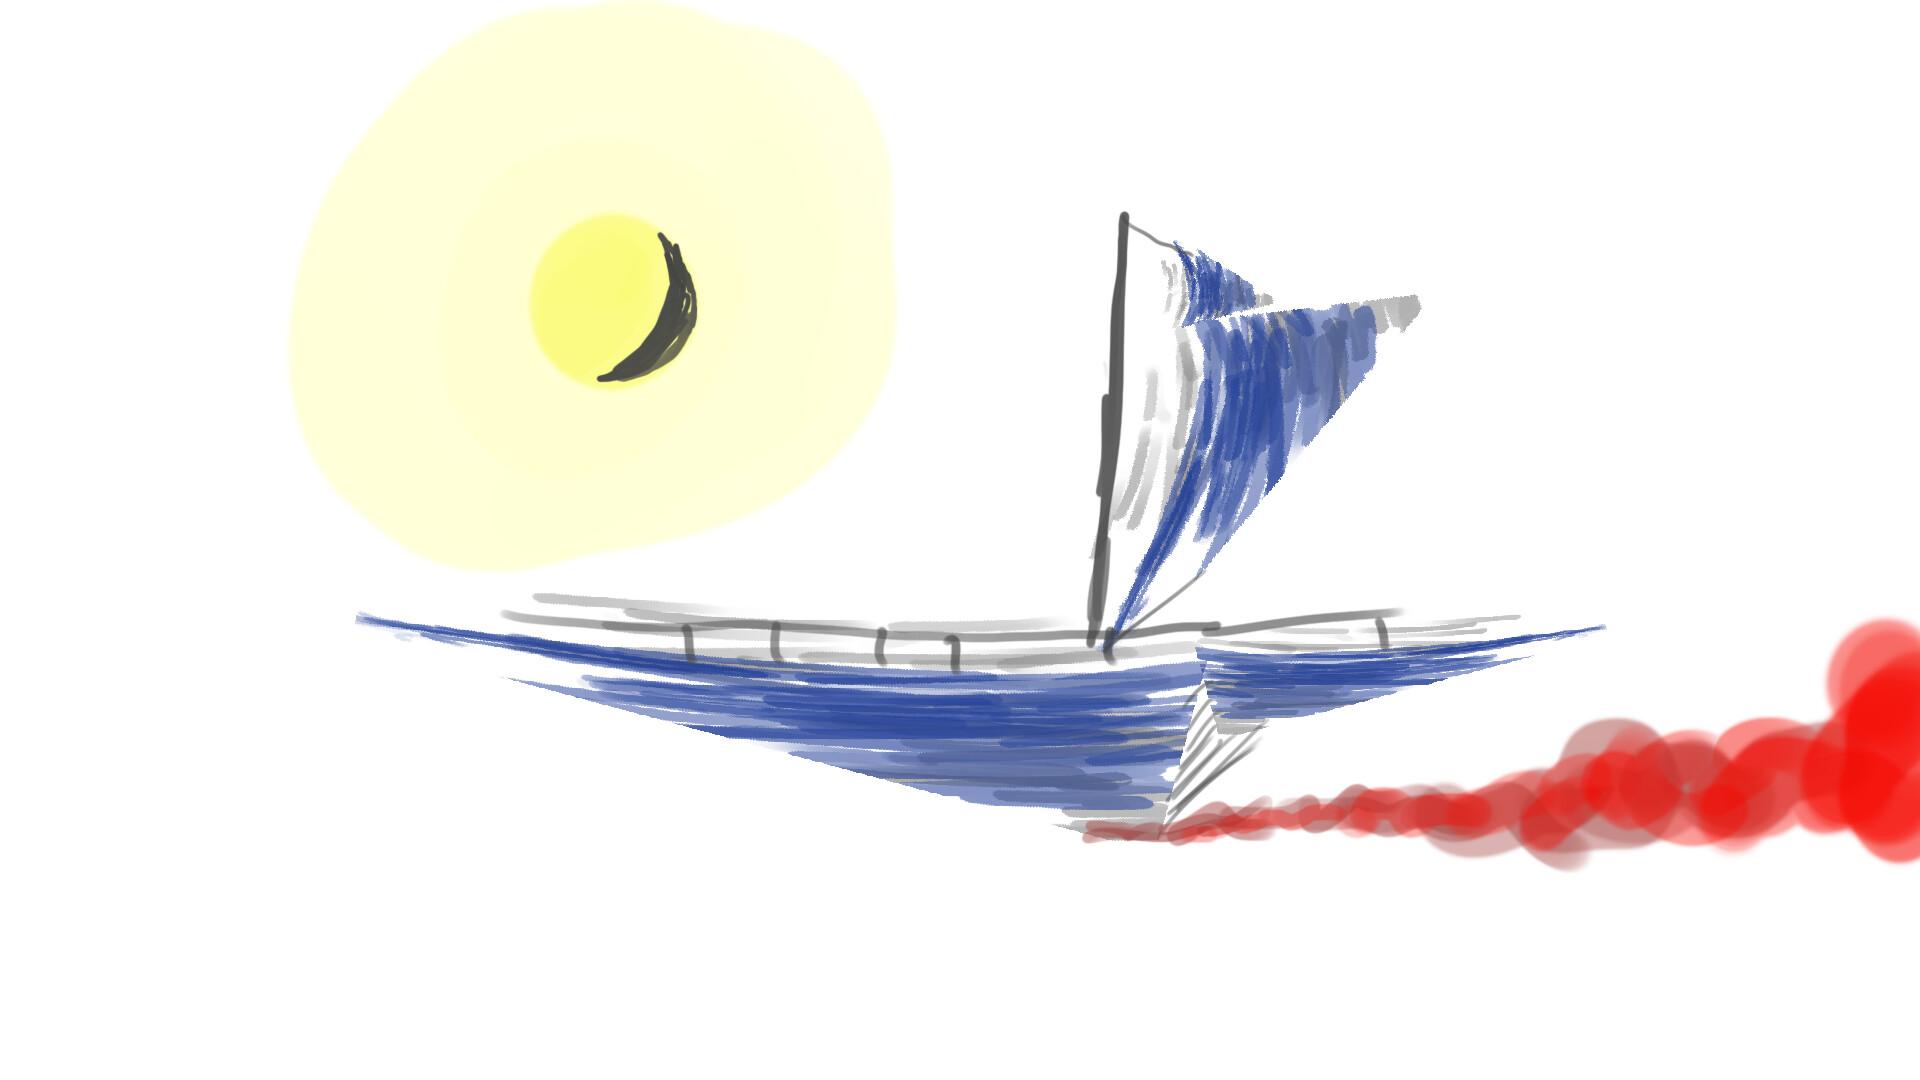 Alexander laheij boat sketch